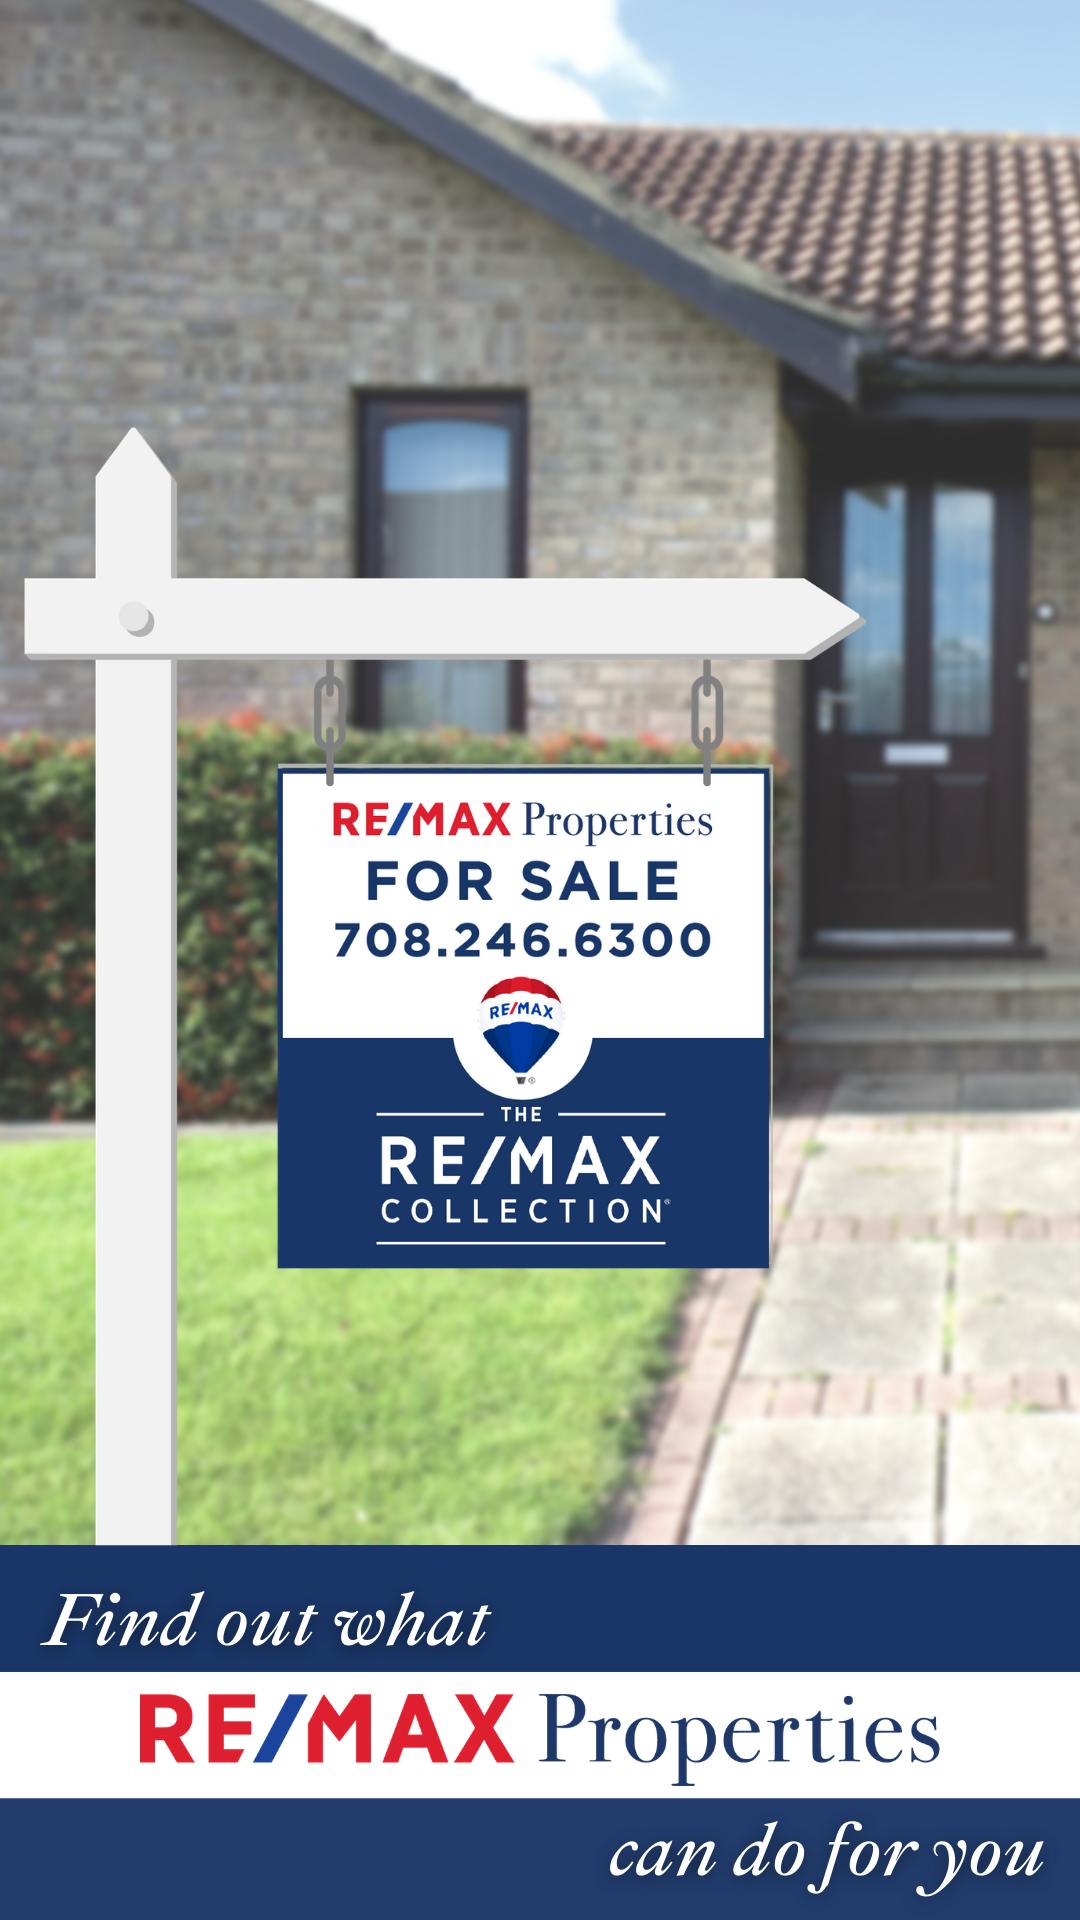 RE/MAX Properties, Western Springs IL